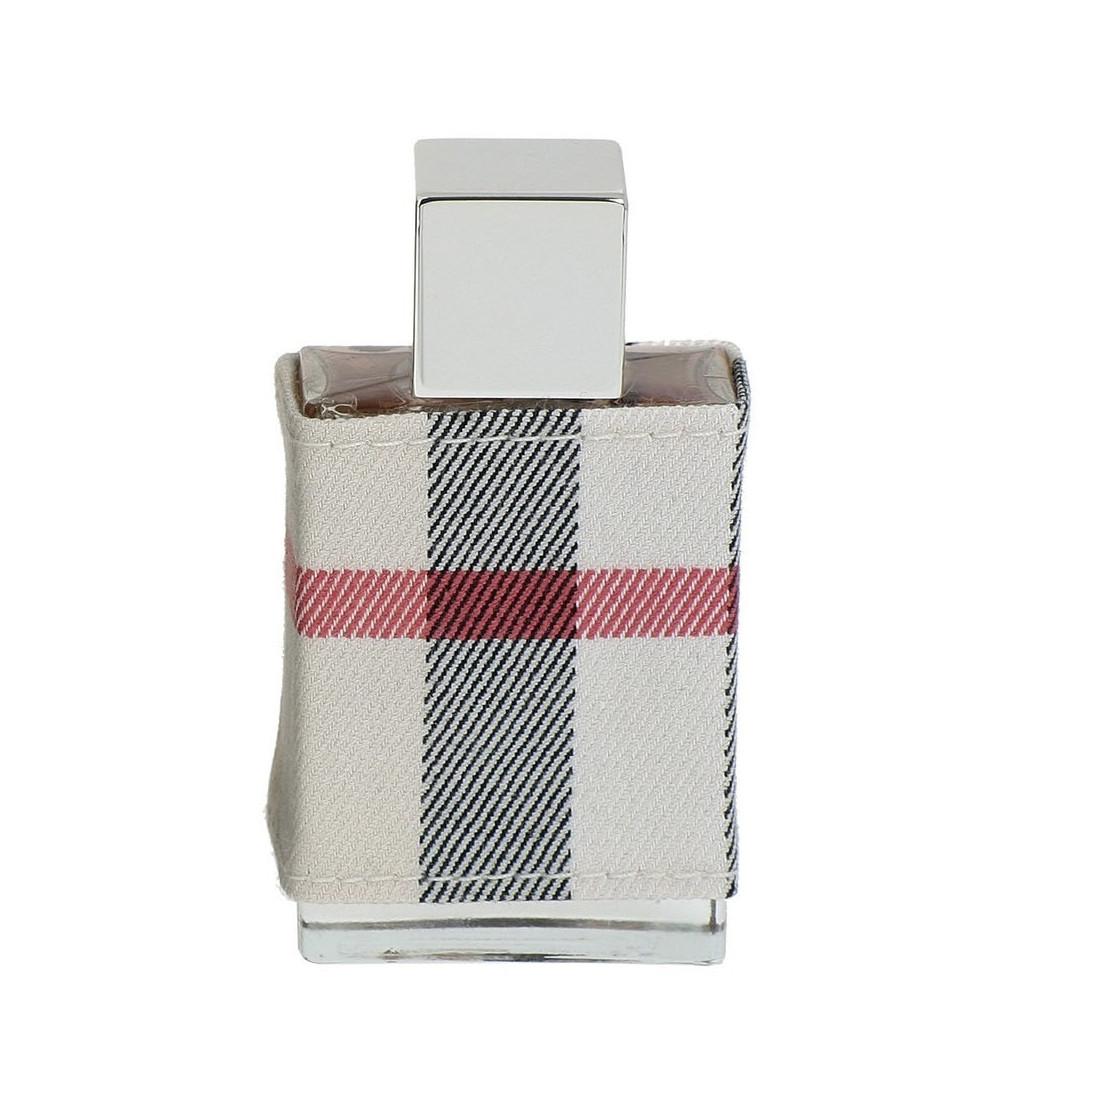 Burberry London For Women Eau De Parfum Spray 30 ml